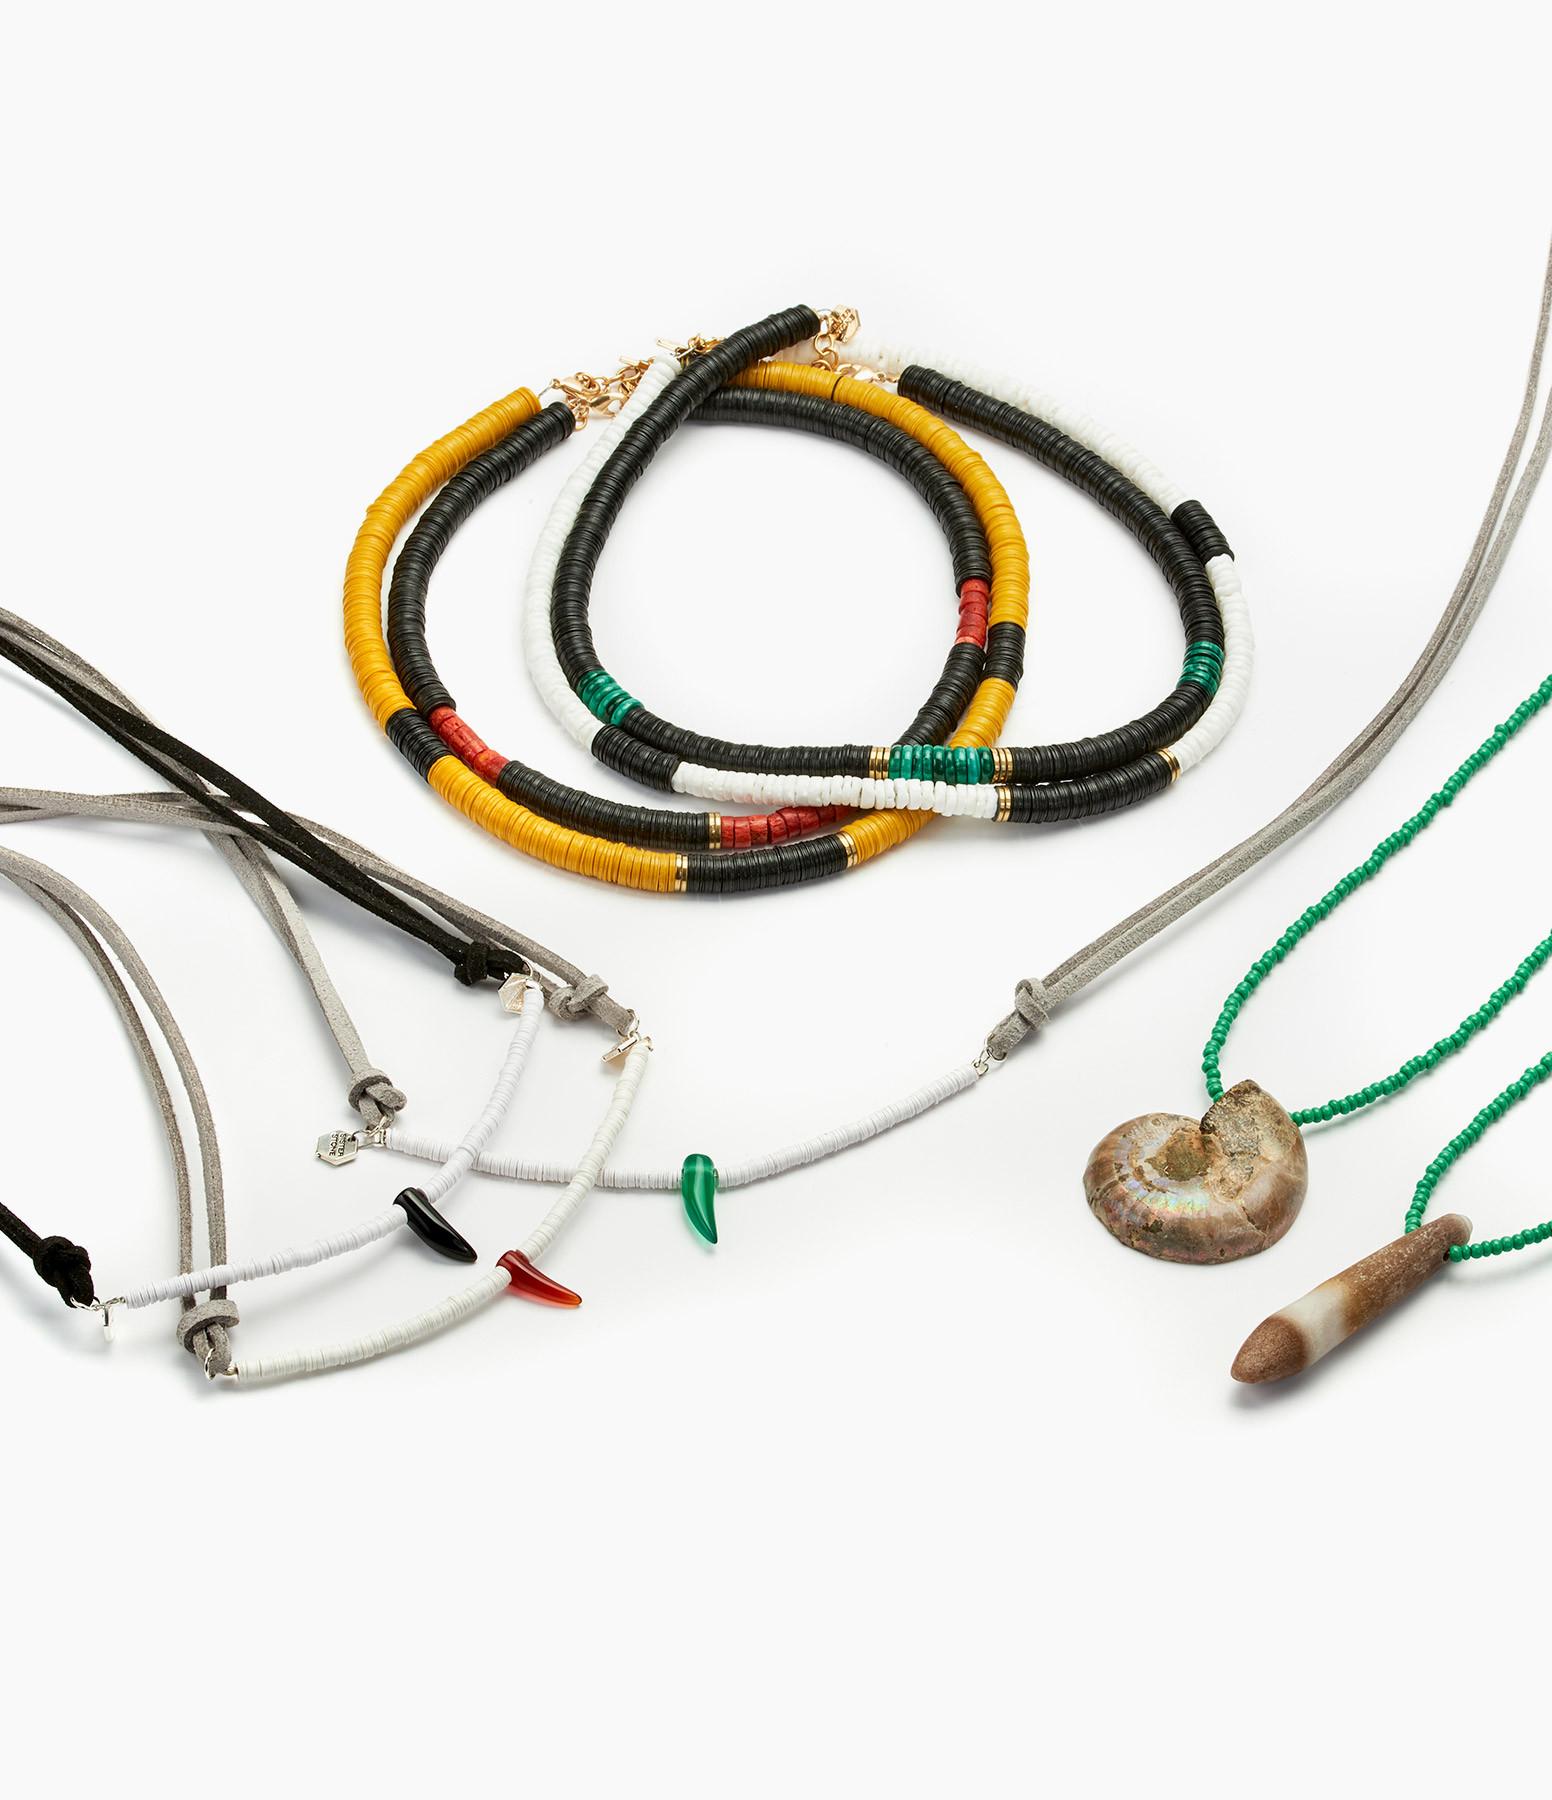 Bracelet Cuir The Pass Gris Rondelle Onyx Vert  - SISTERSTONE